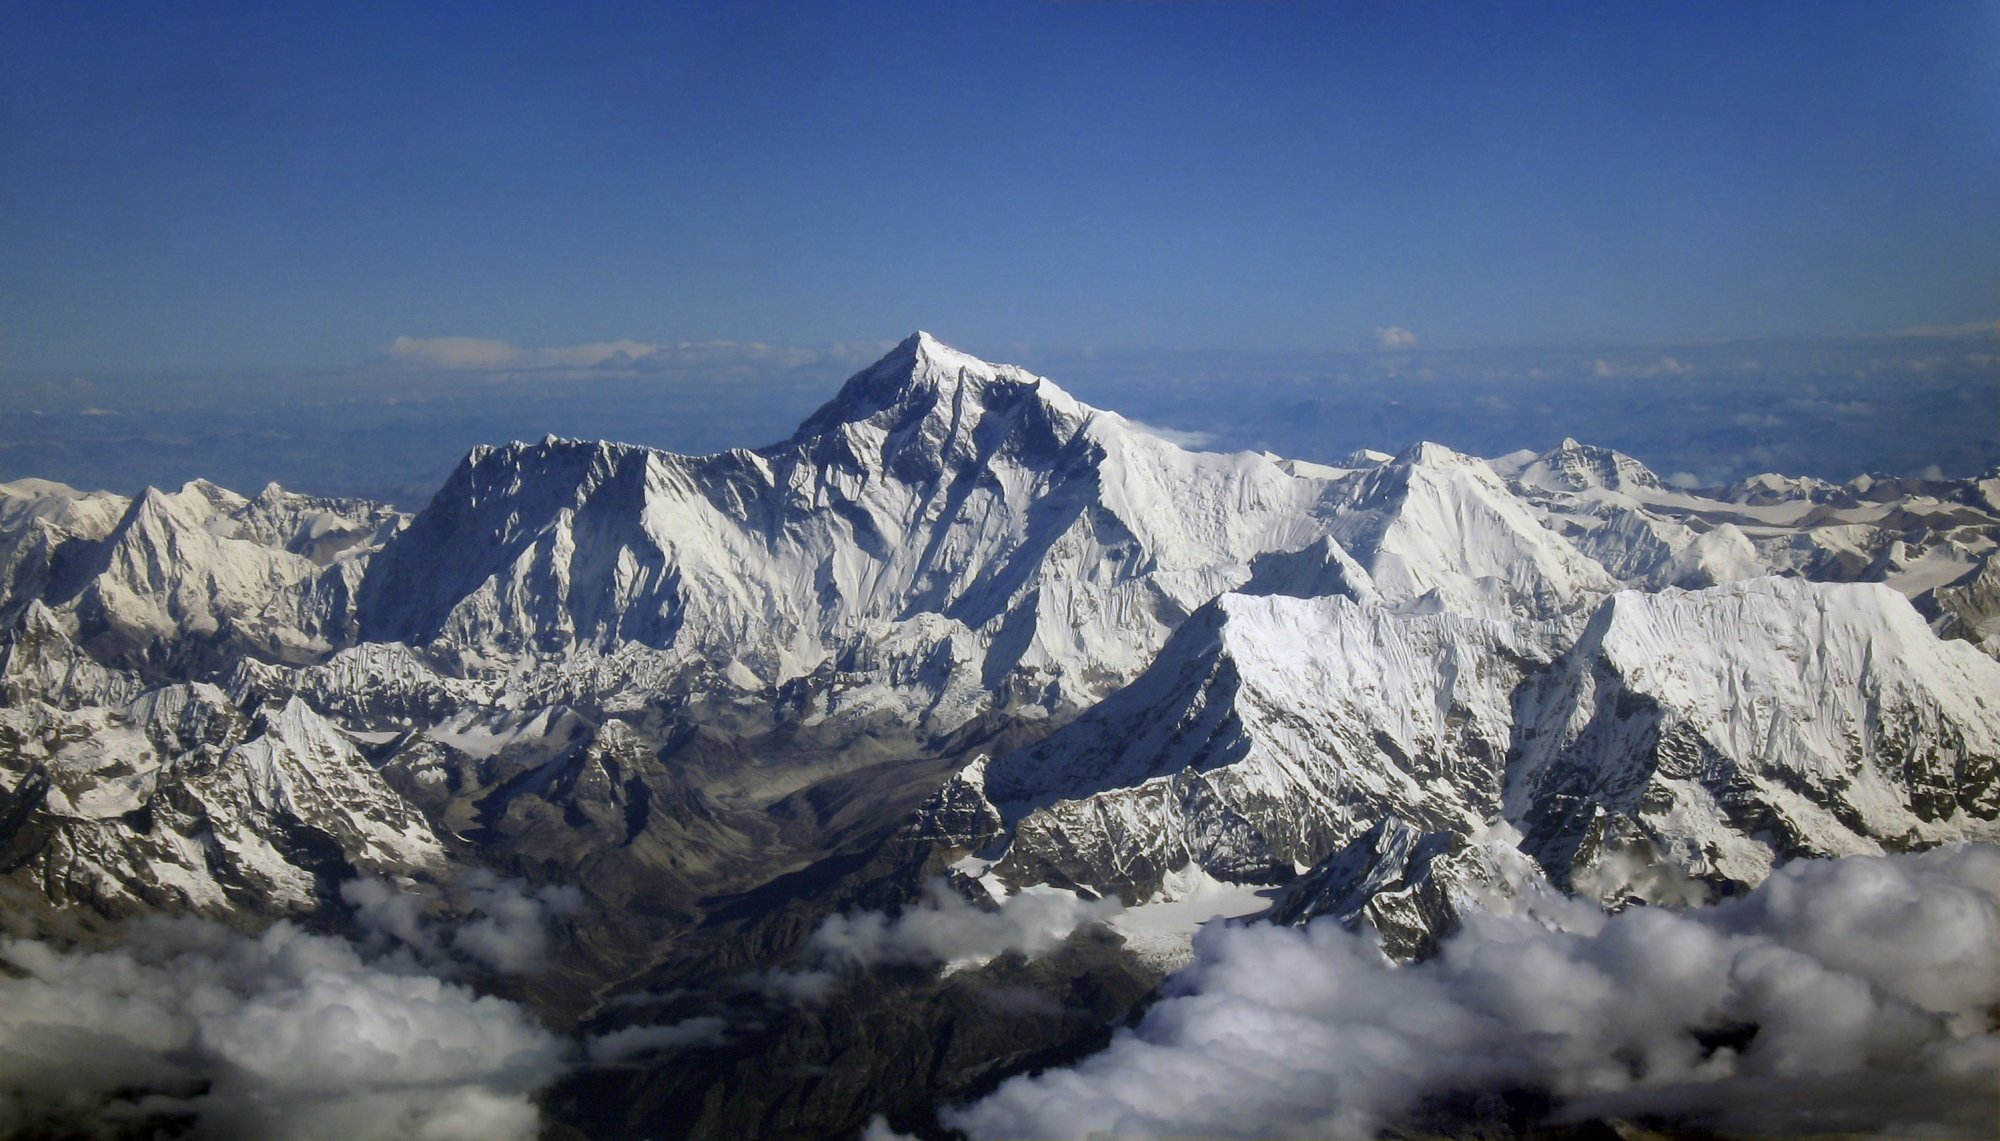 Mt. Everest.jpg